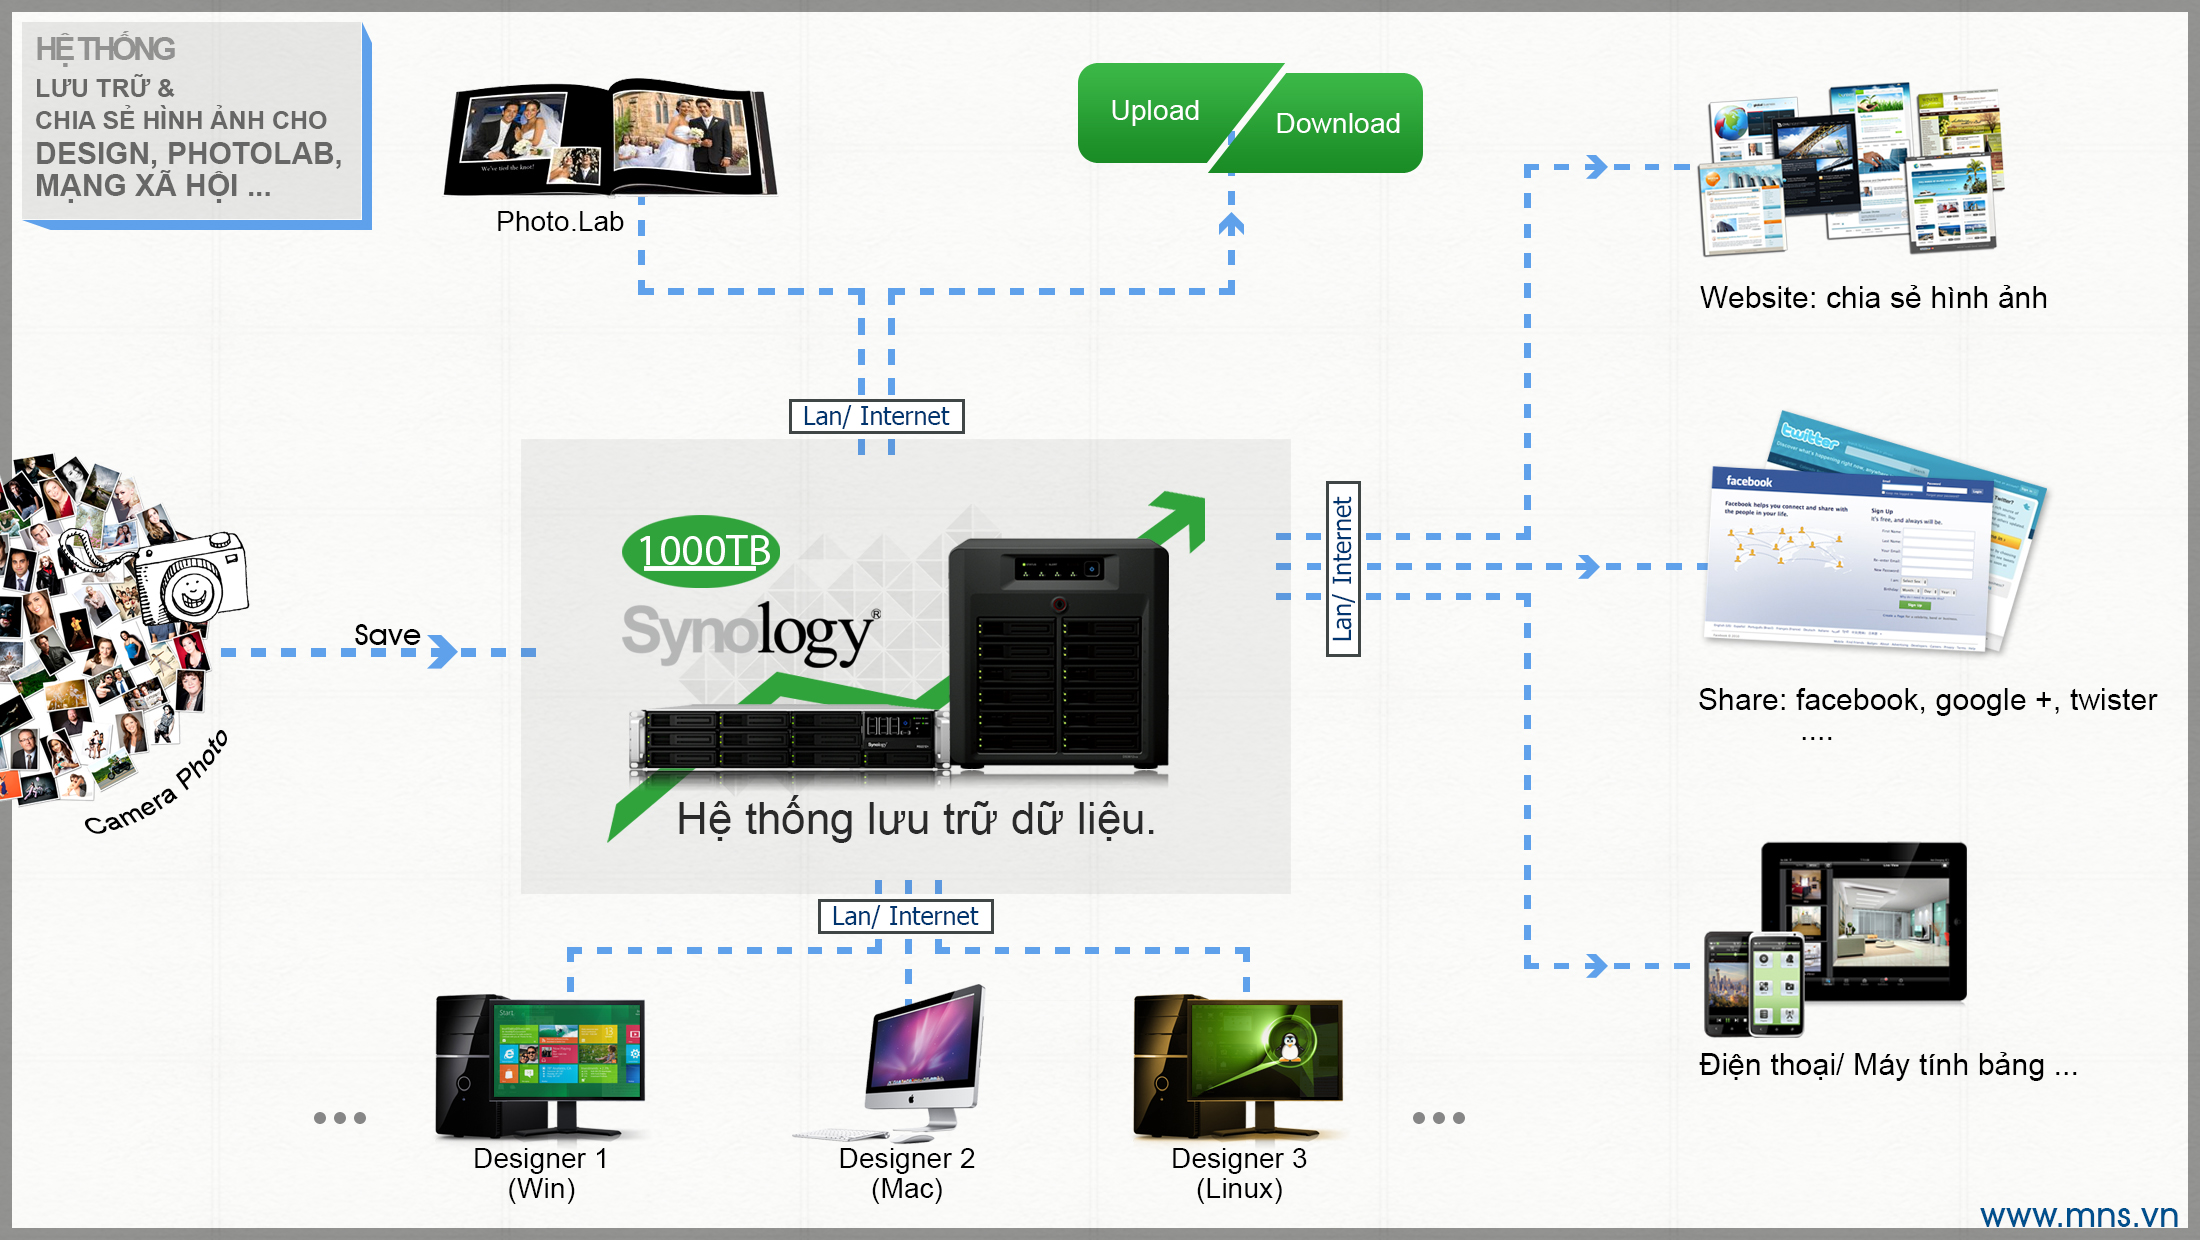 1-giai-phap-luu-tru-hinh-anh-photo-an-toan-chuyen-nghiep-studio-nhiep-anh-thuong-mai-design-thiet-ke-in-an-mns-nas-synology-server-website-blog-portfolio